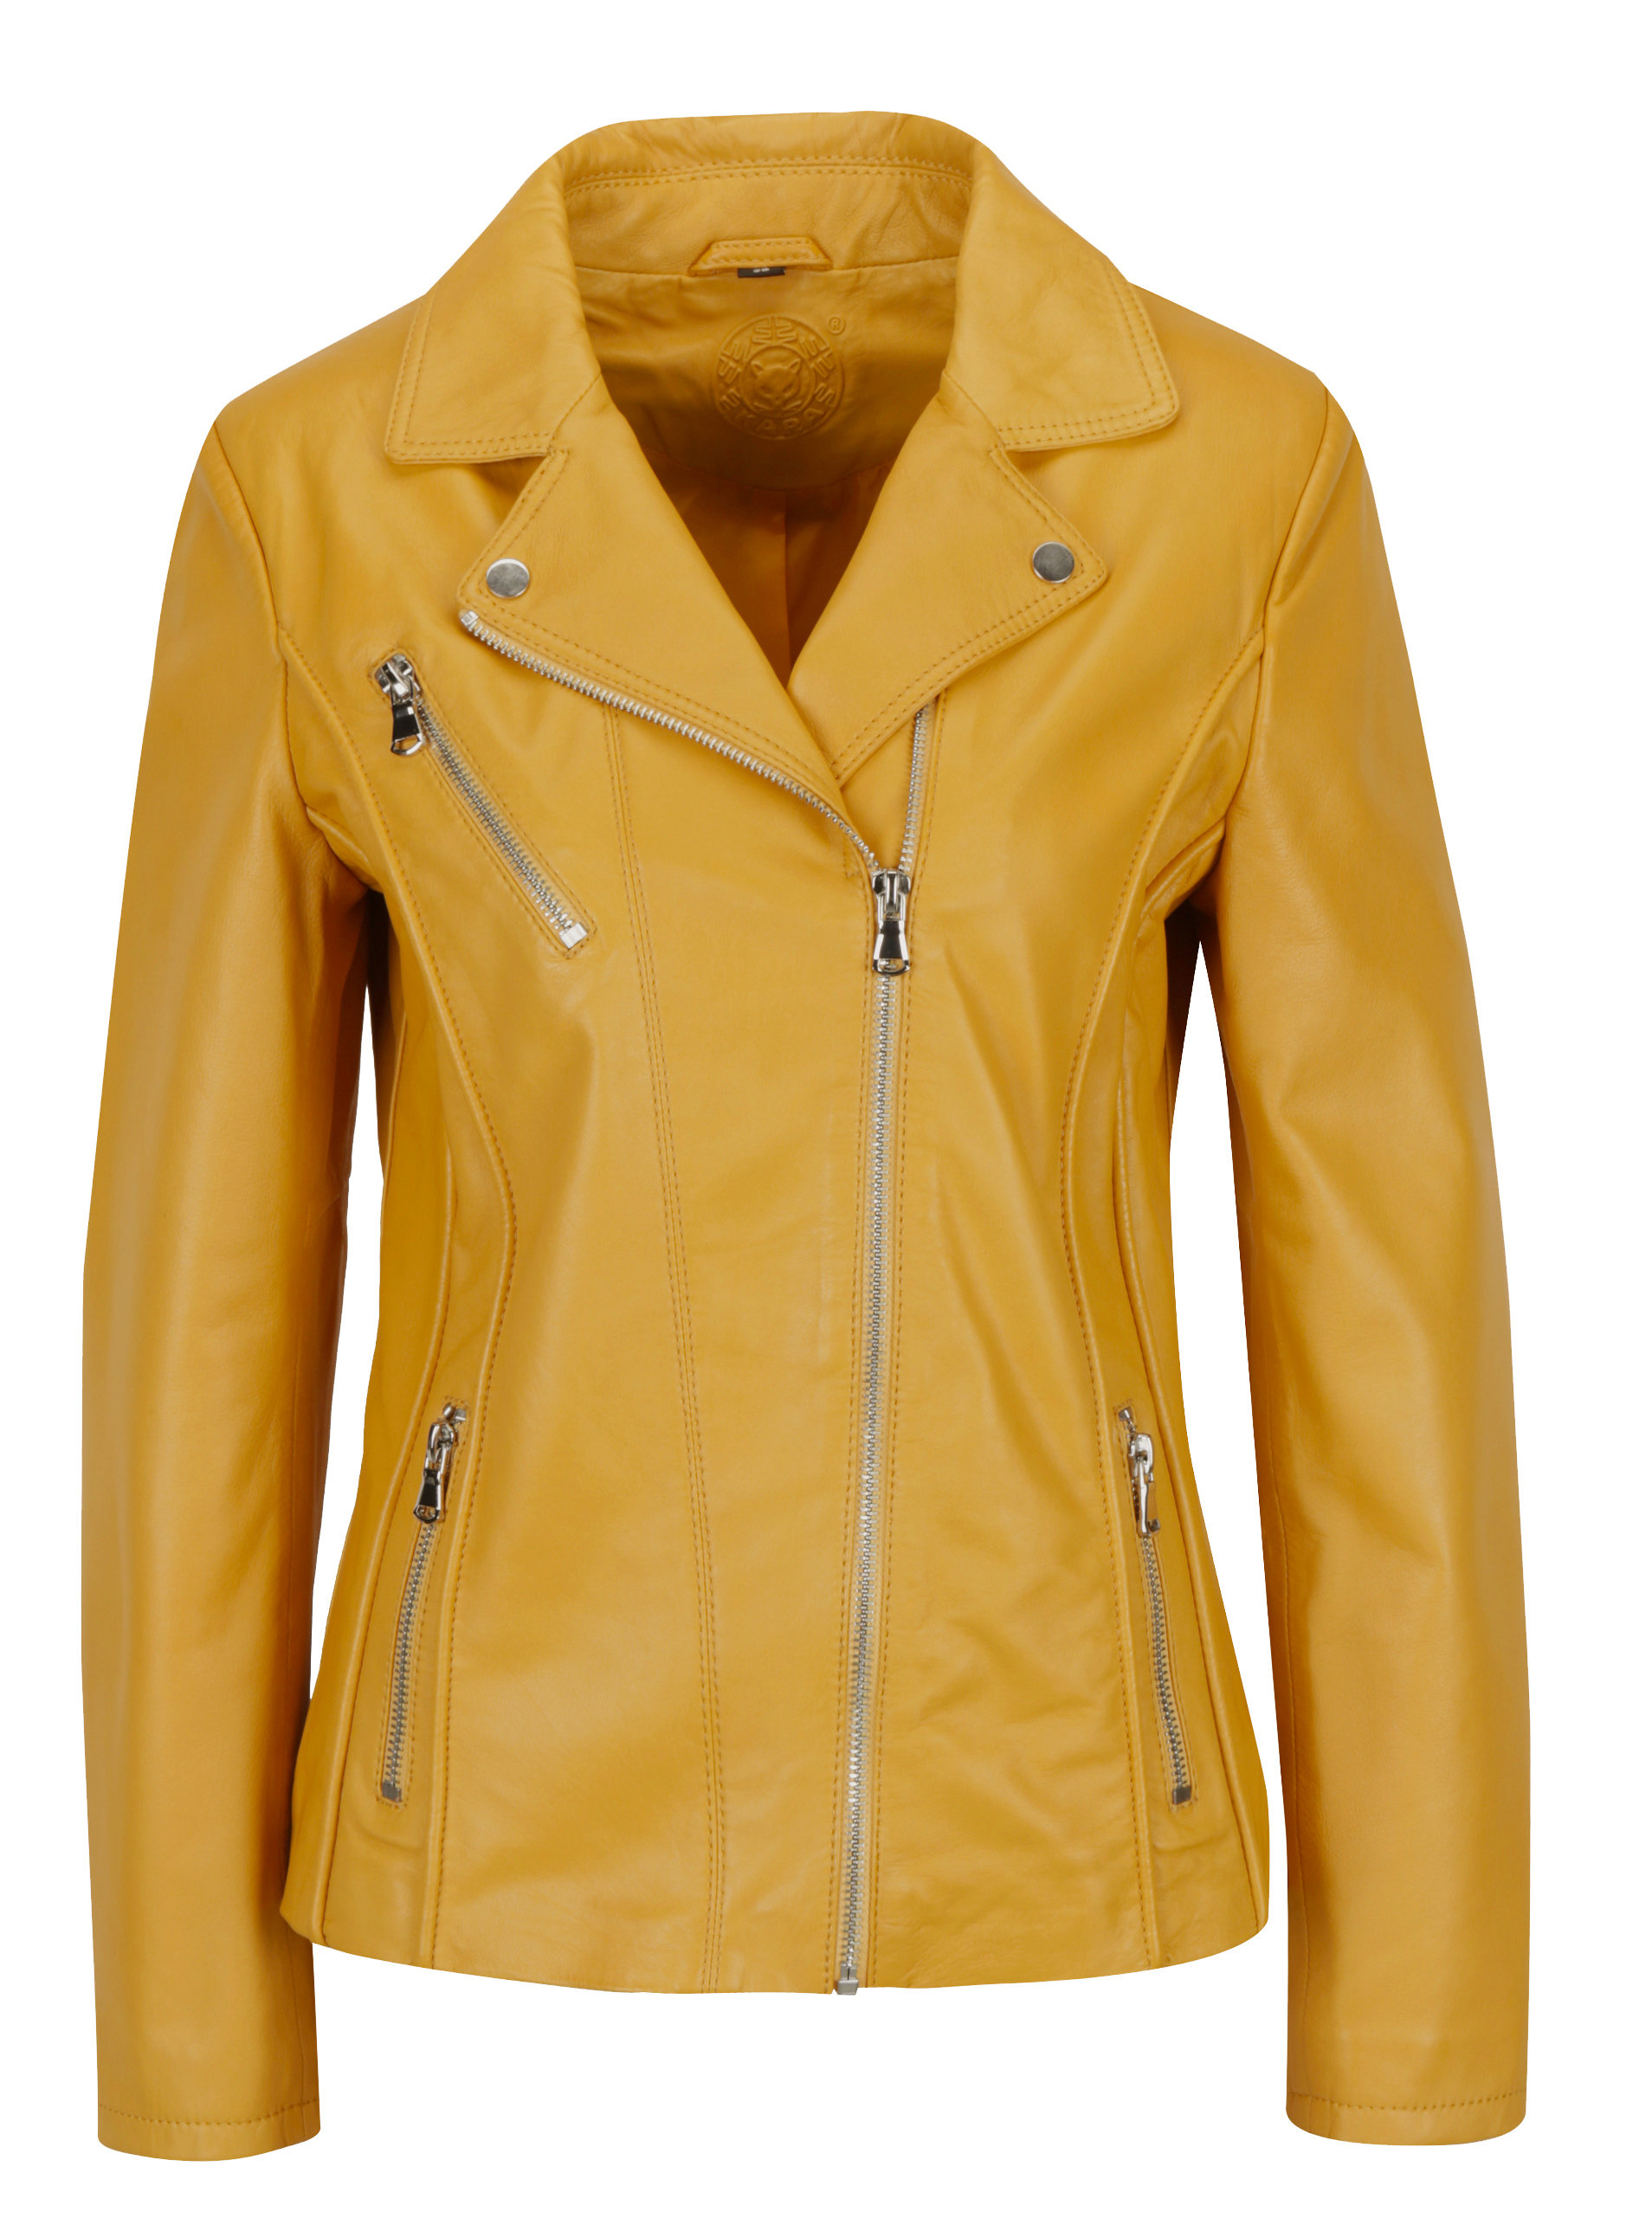 Žlutý dámský kožený křivák KARA Kenya ... 118c7c8035f